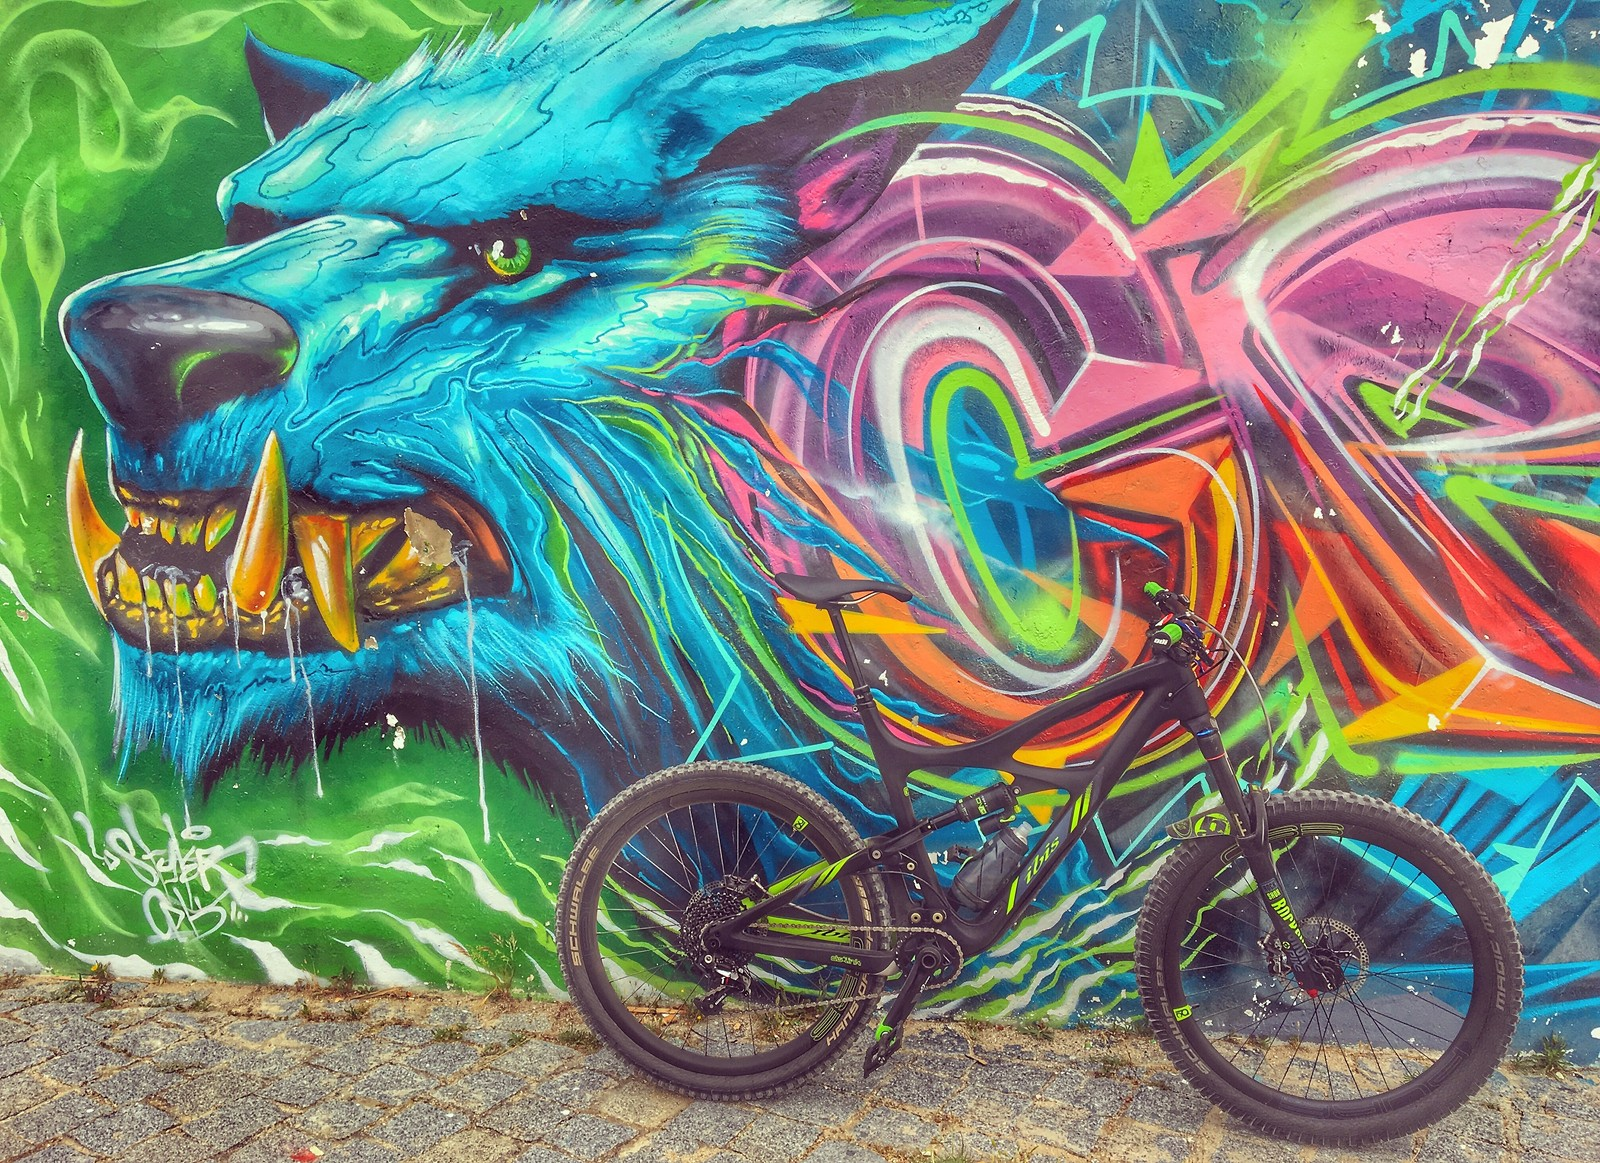 Lisbon streetart and bike design art